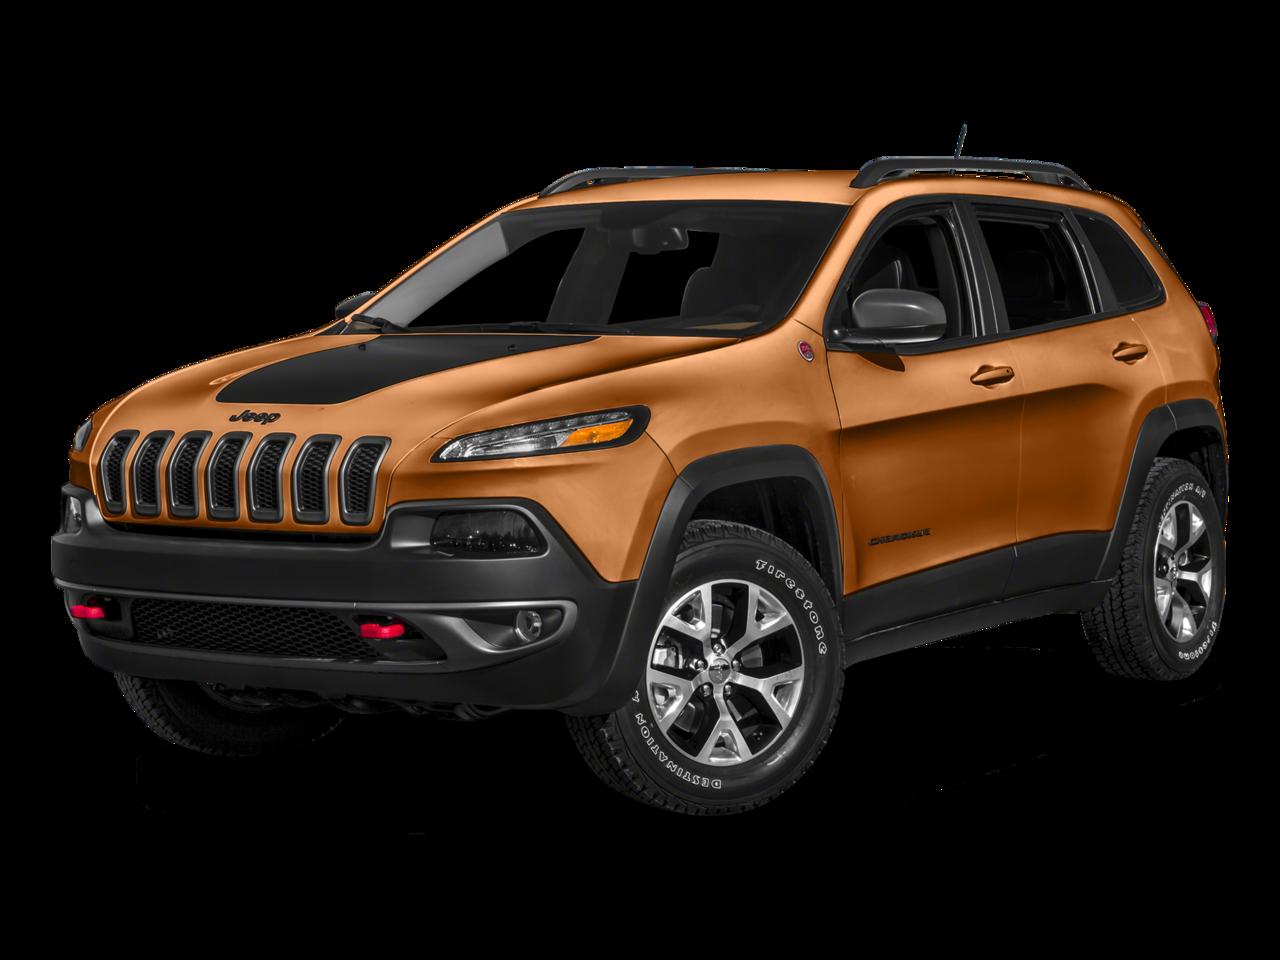 2017 jeep cherokee rothrock motors allentown pa. Black Bedroom Furniture Sets. Home Design Ideas